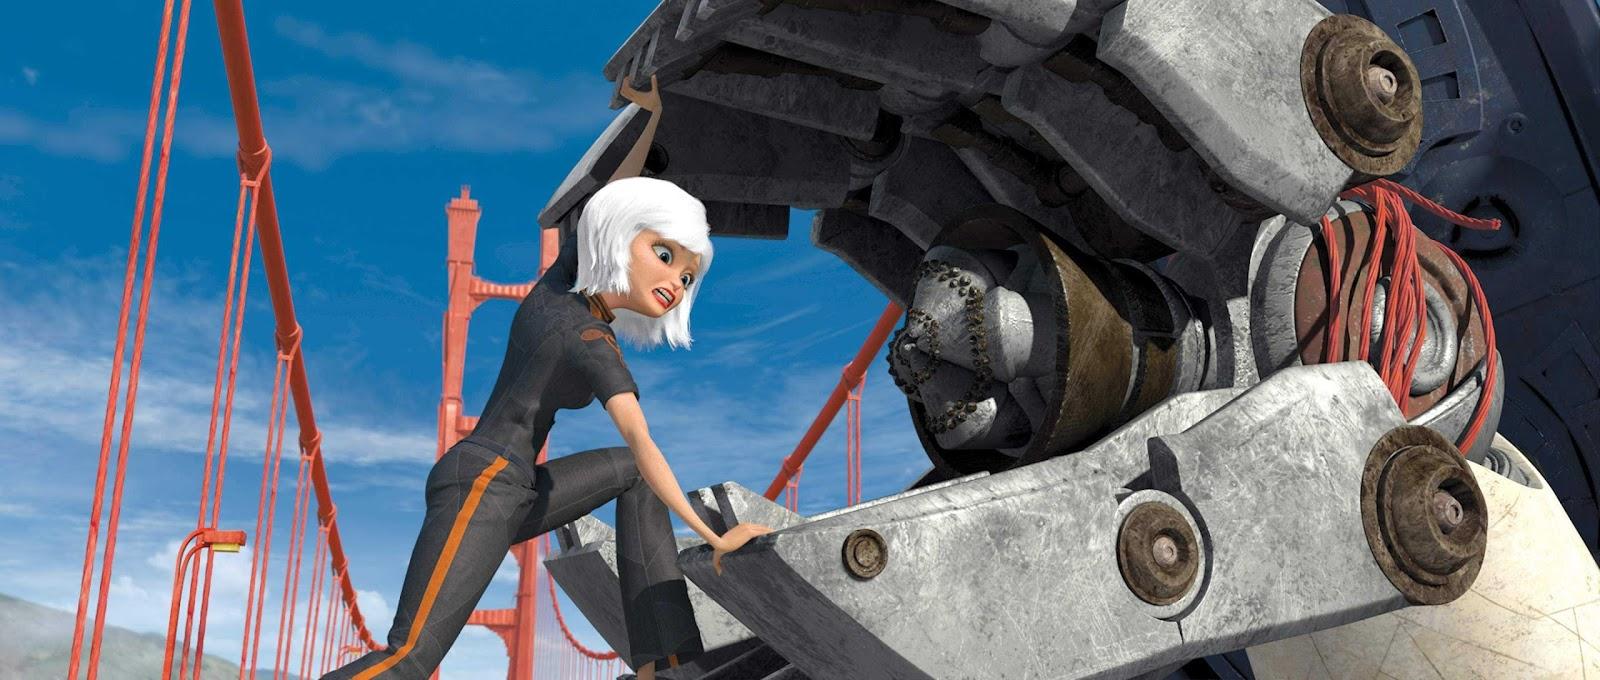 Monsters vs Aliens wallpapers desktop background HD 3D movie review  2